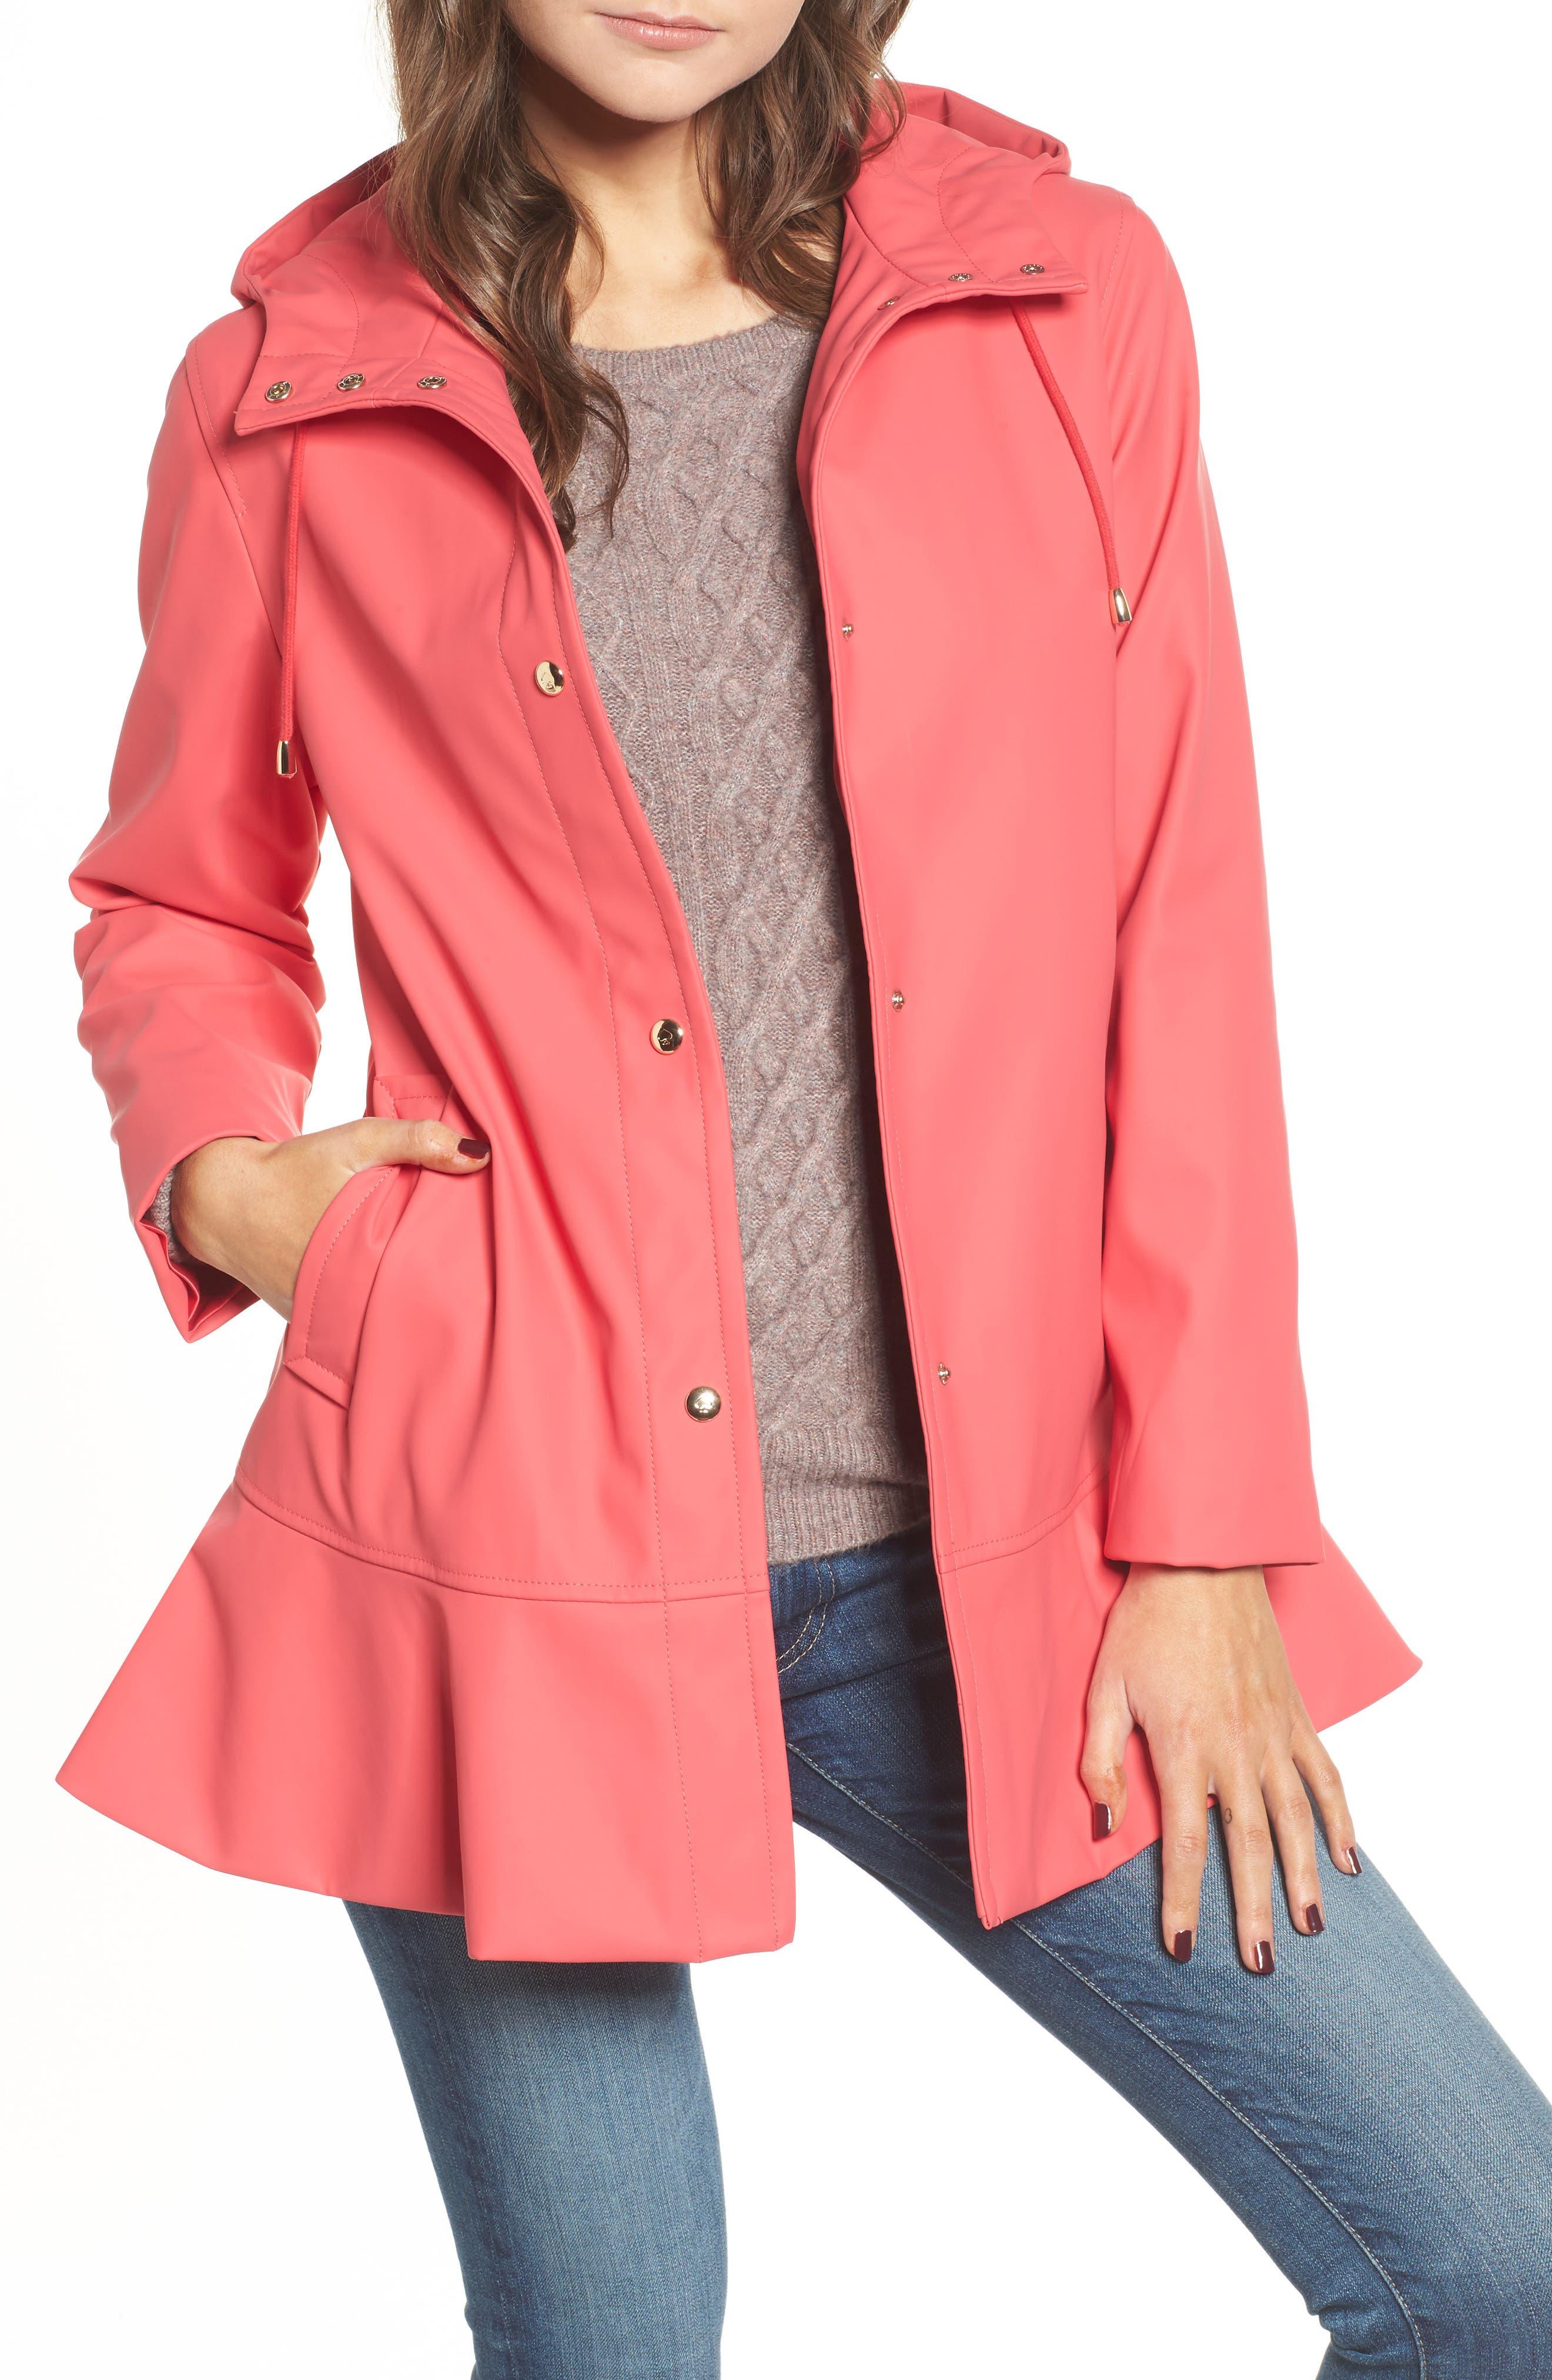 Alternate Image 1 Selected - kate spade new york hooded peplum rain coat